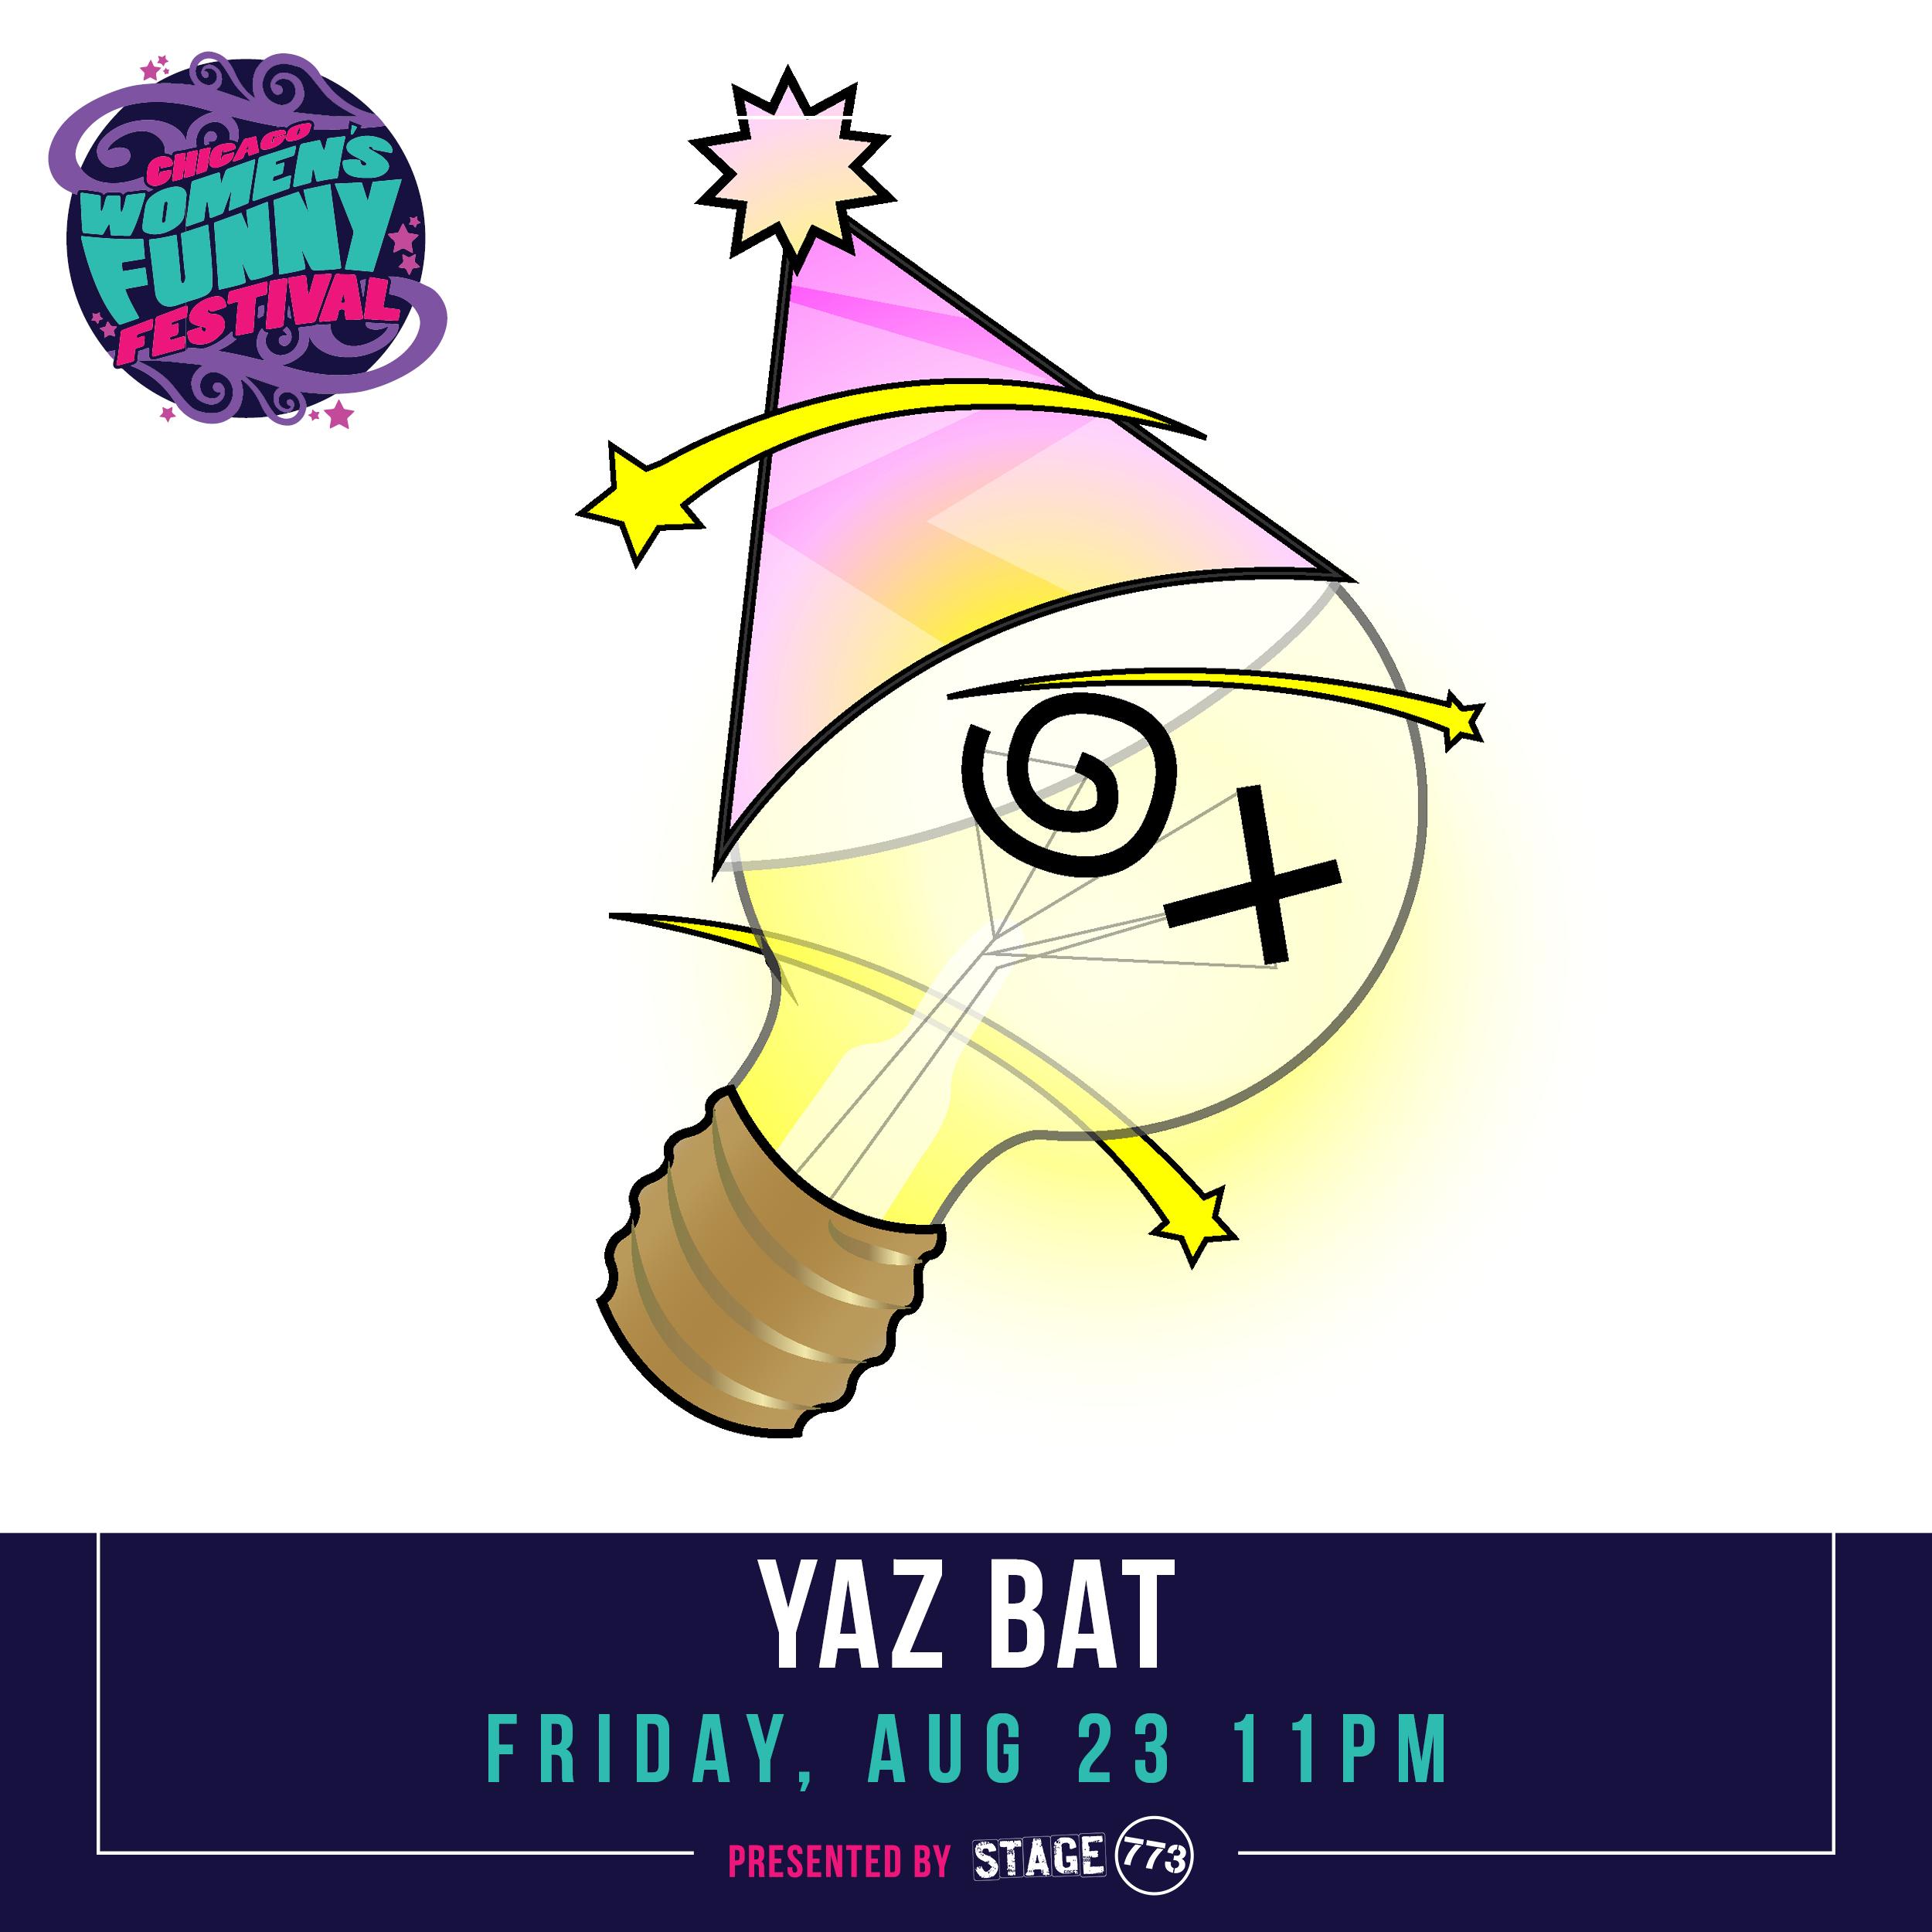 YazBat_Friday_11PM_CWFF2019.jpg